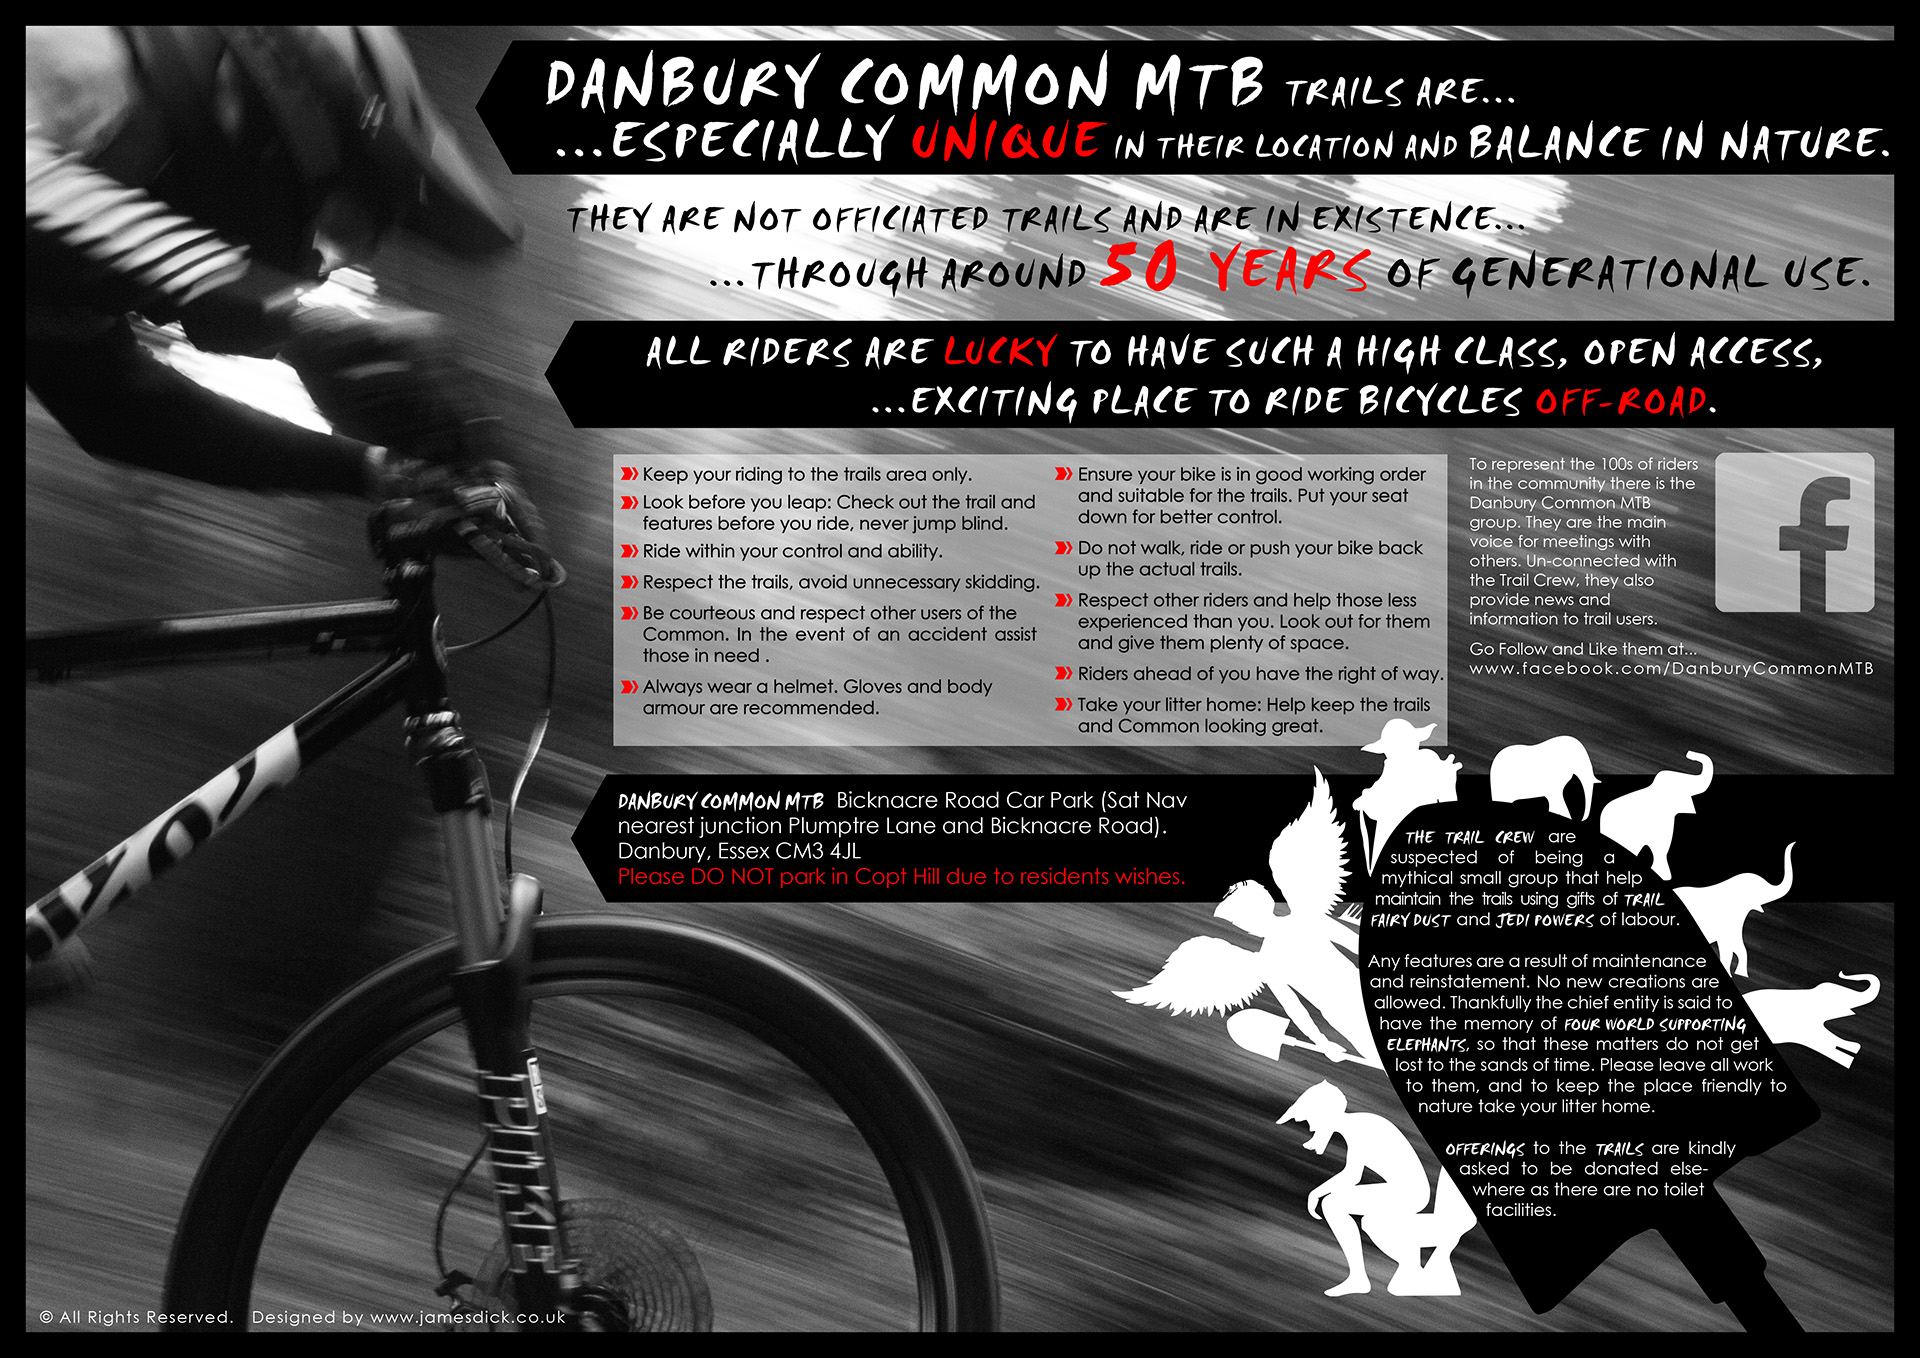 Danbury Common MTB trail map 007 highest